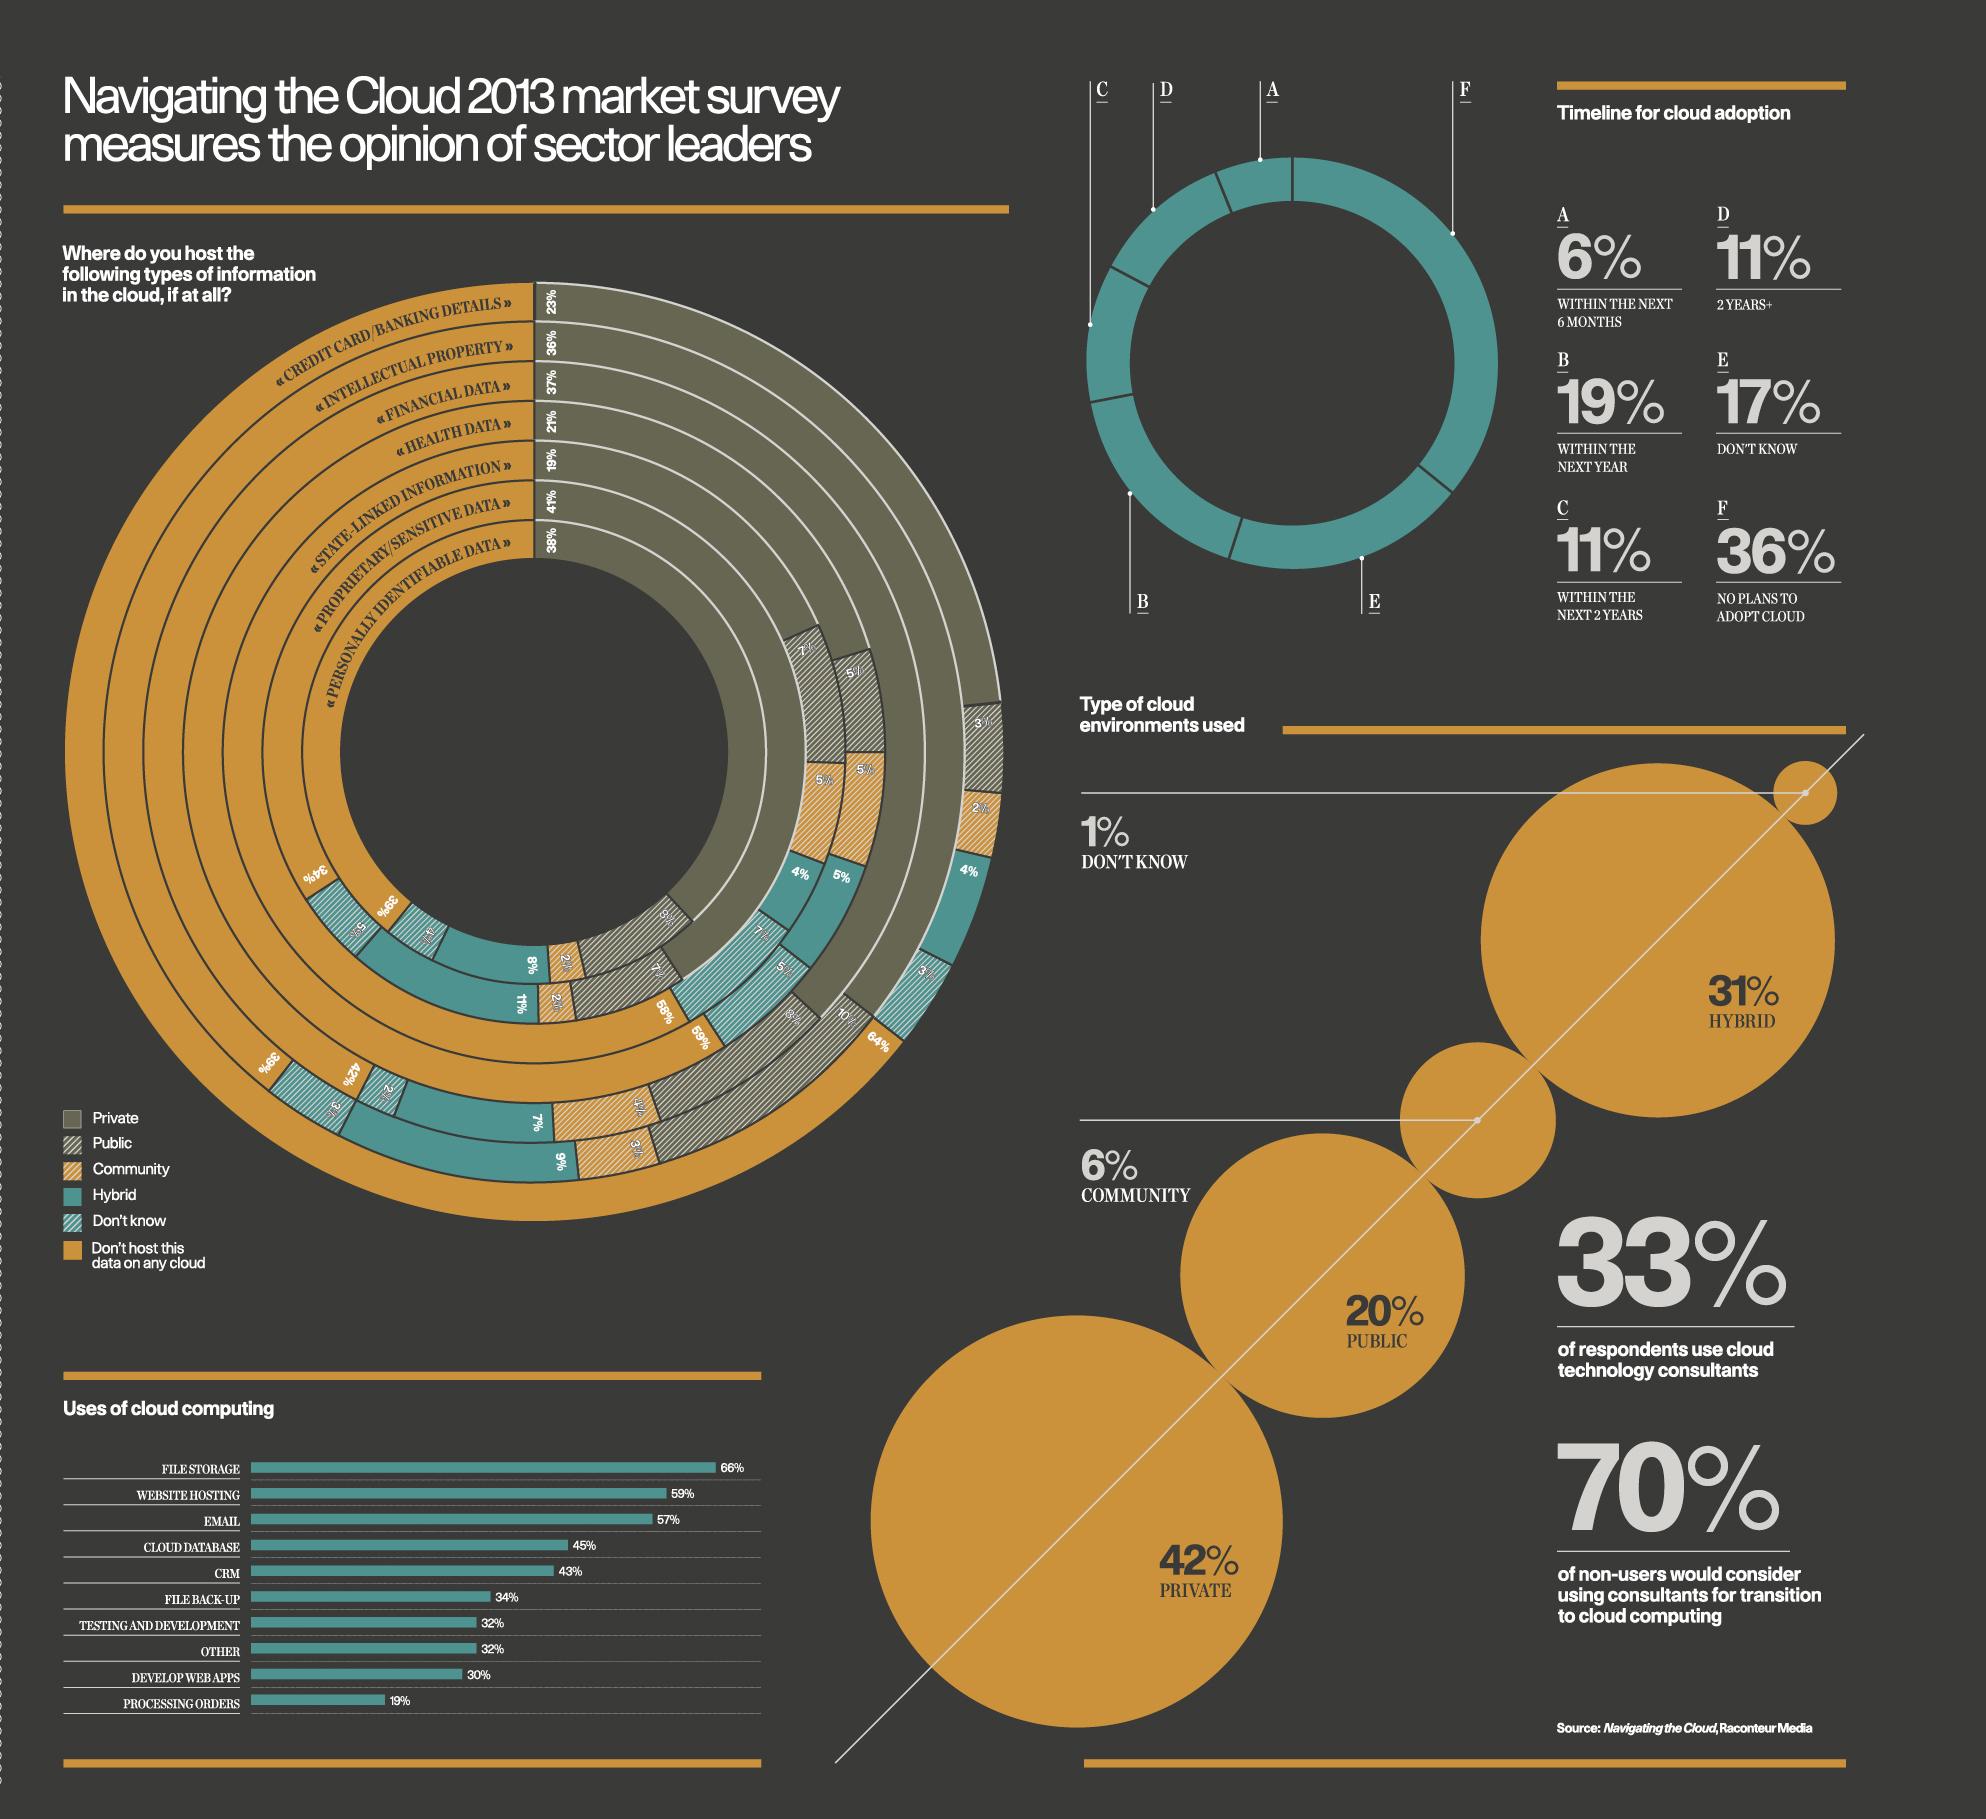 navigating-the-cloud-market-research_50ae5203a8b0e